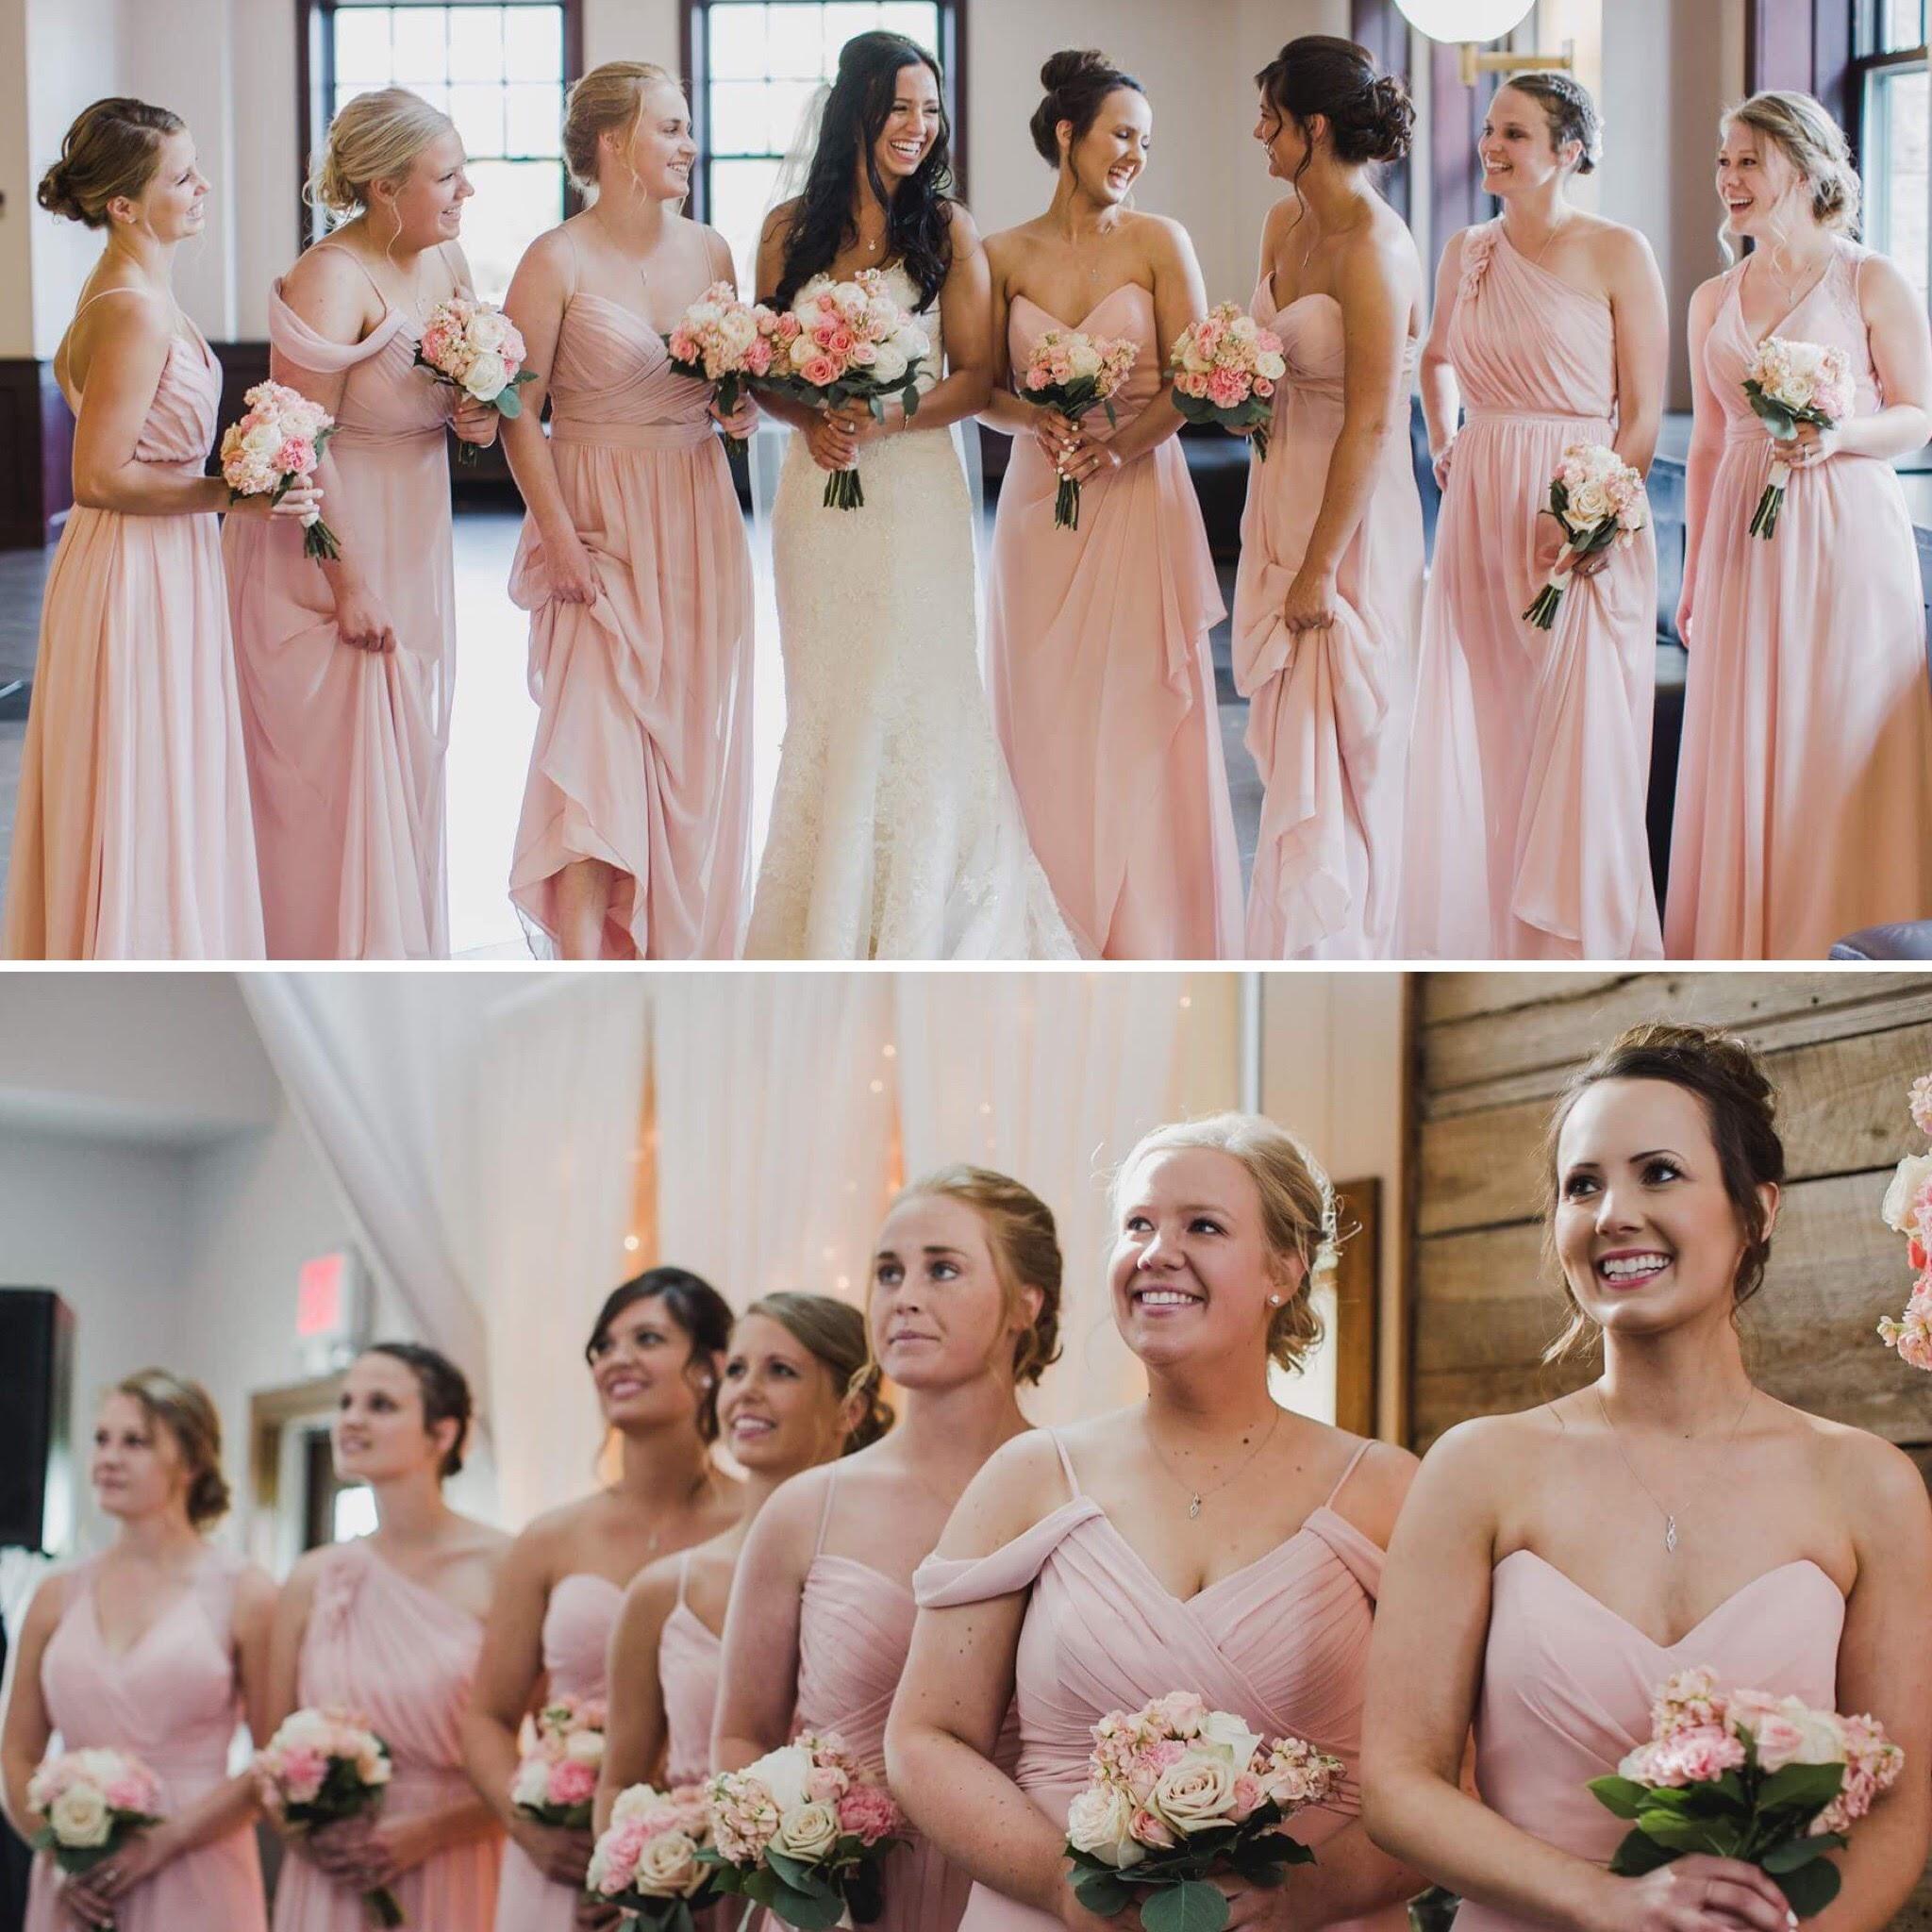 Jillian's Bridal Party